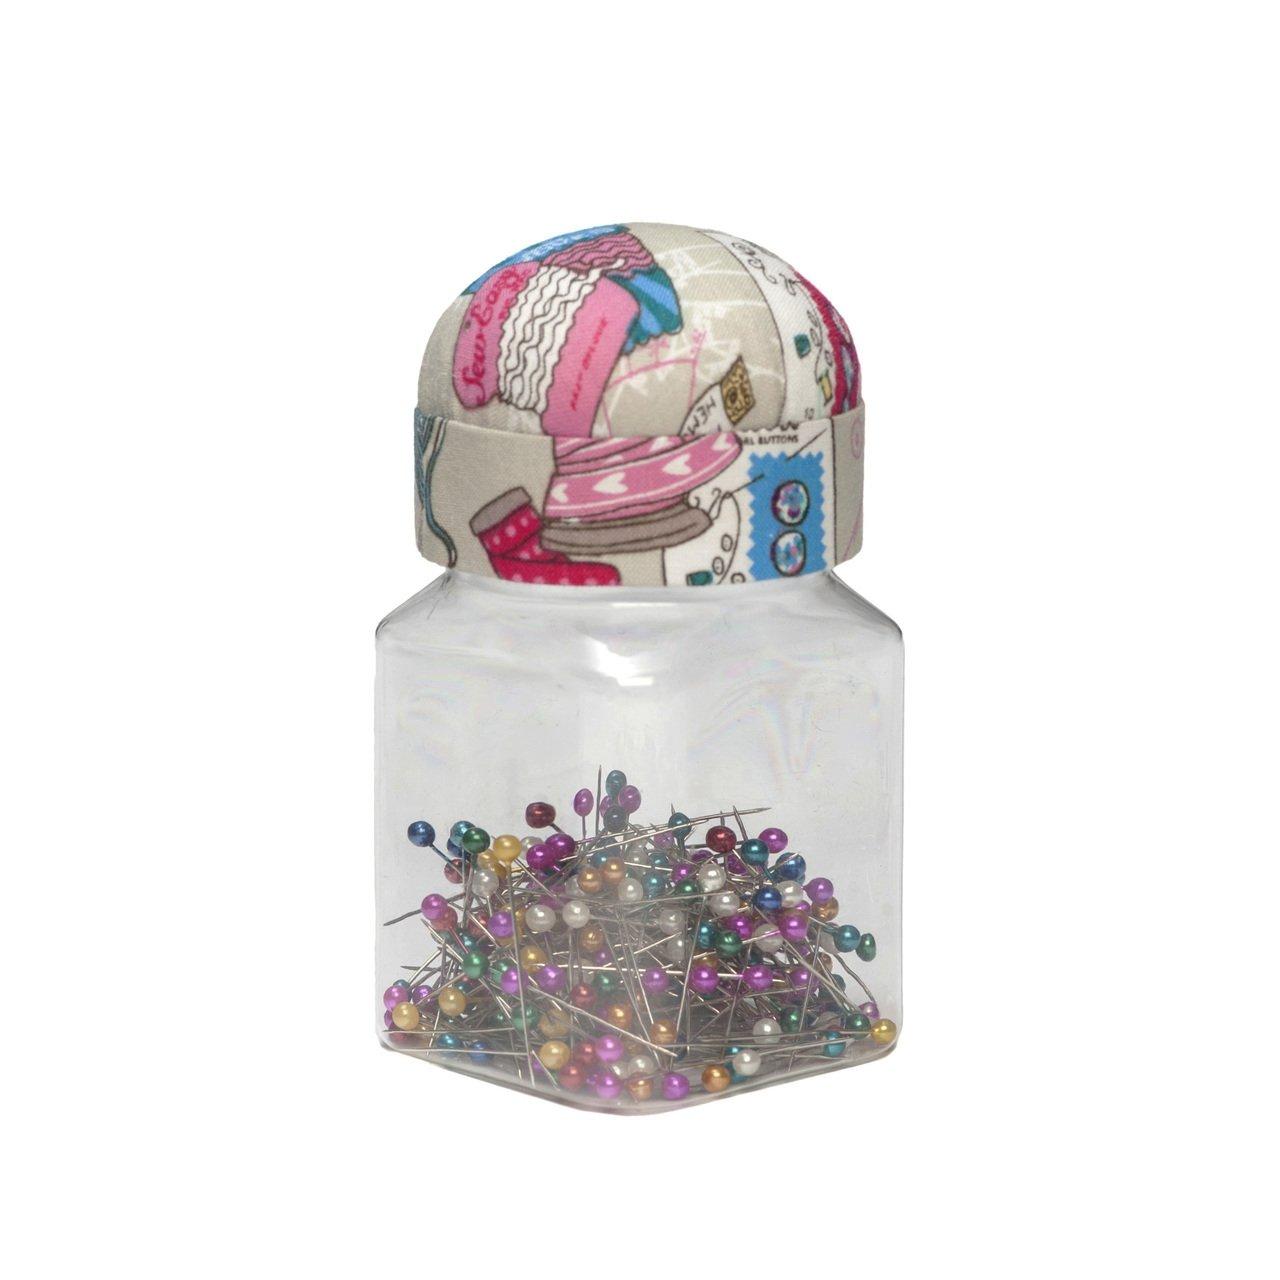 HobbyGift TK16/120 | Pin Cushion Jar Lid: (Pins): Notions Groves